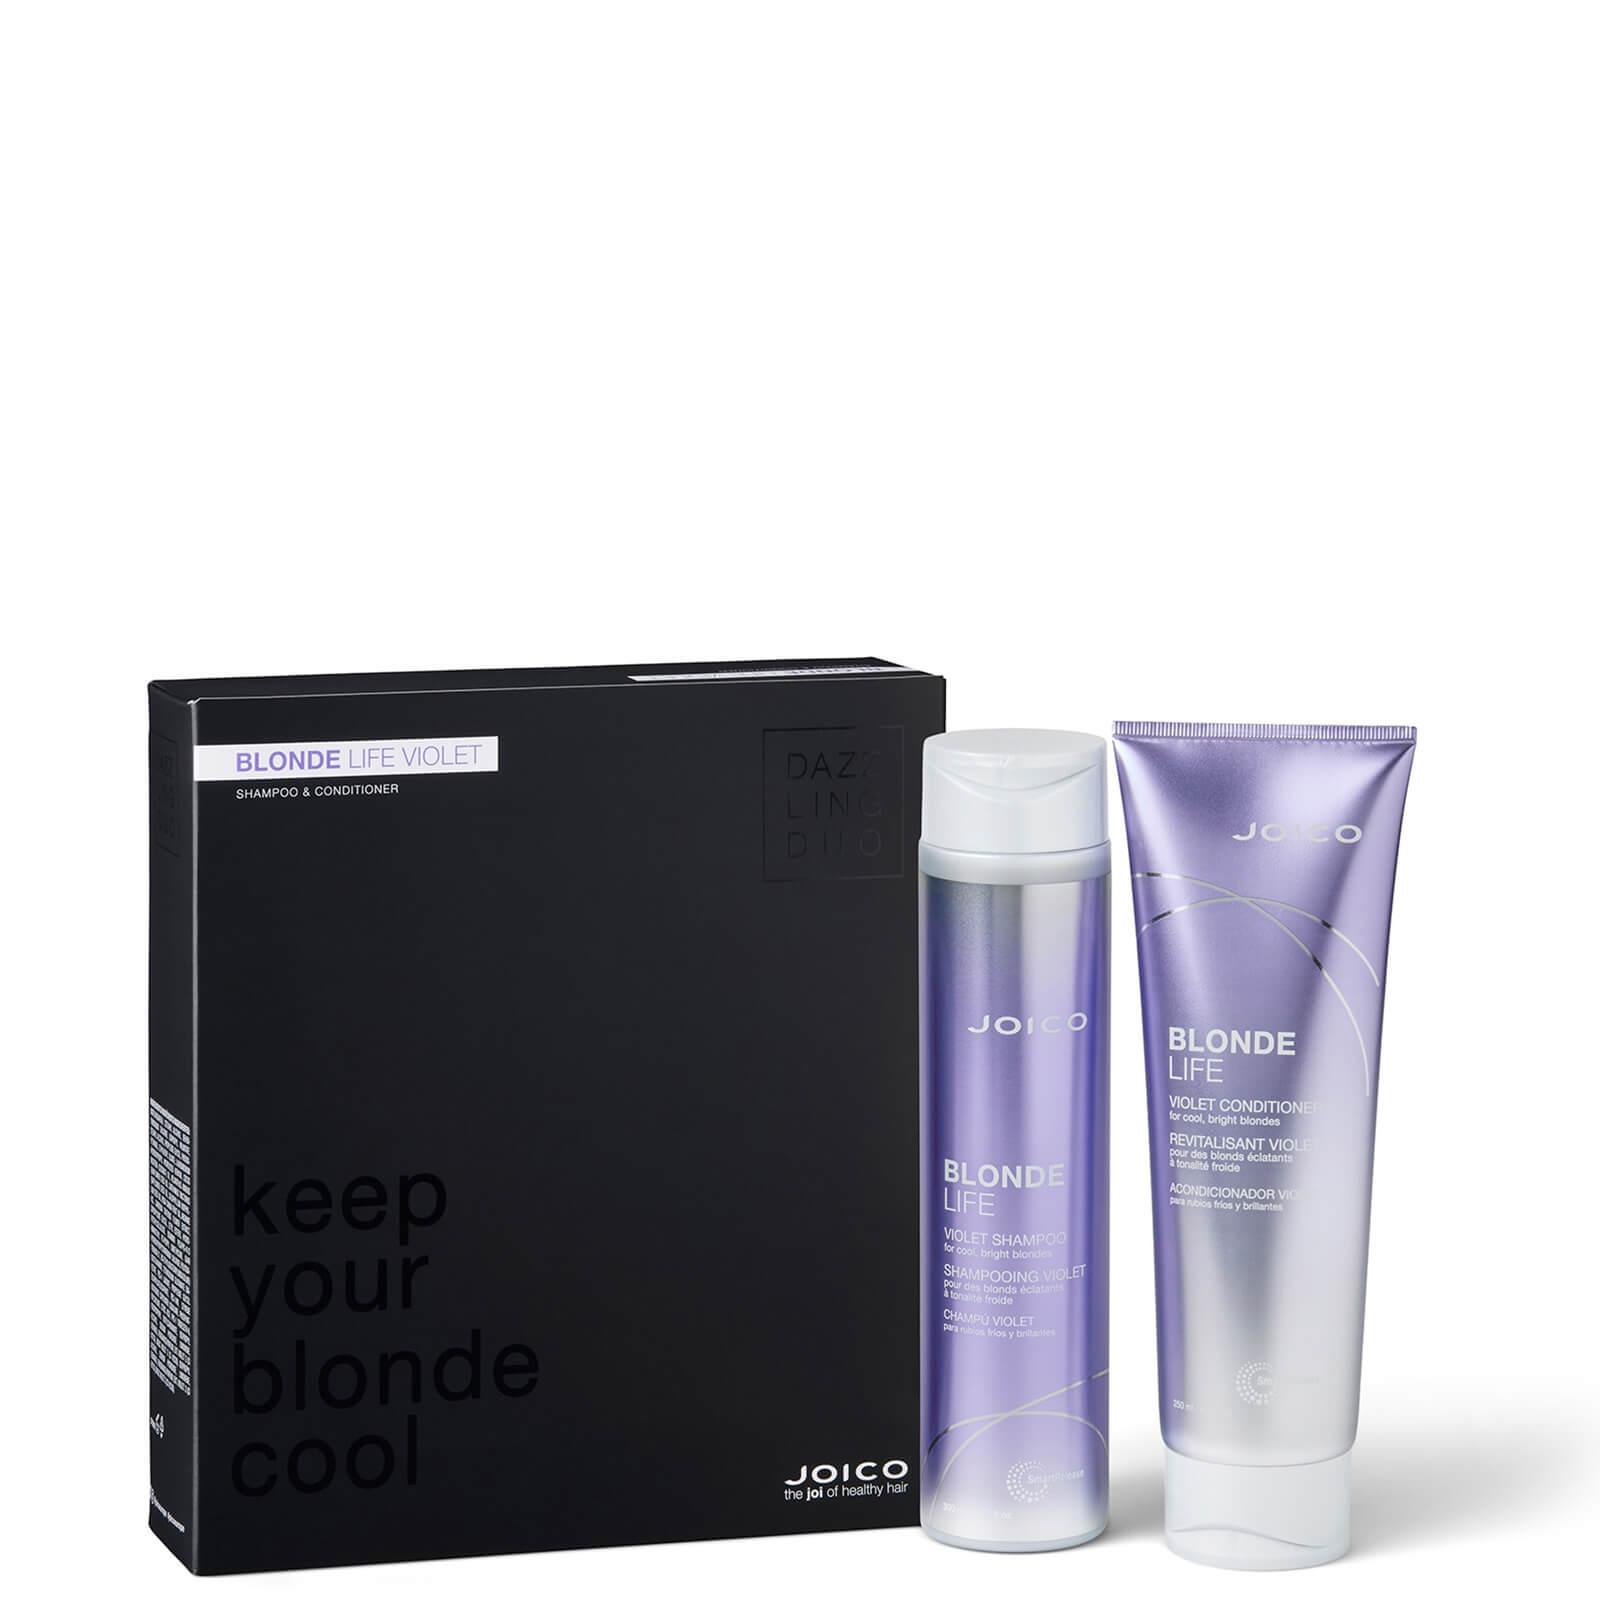 Купить JOICO Blonde Life Violet Shampoo and Conditioner Dazzling Duo